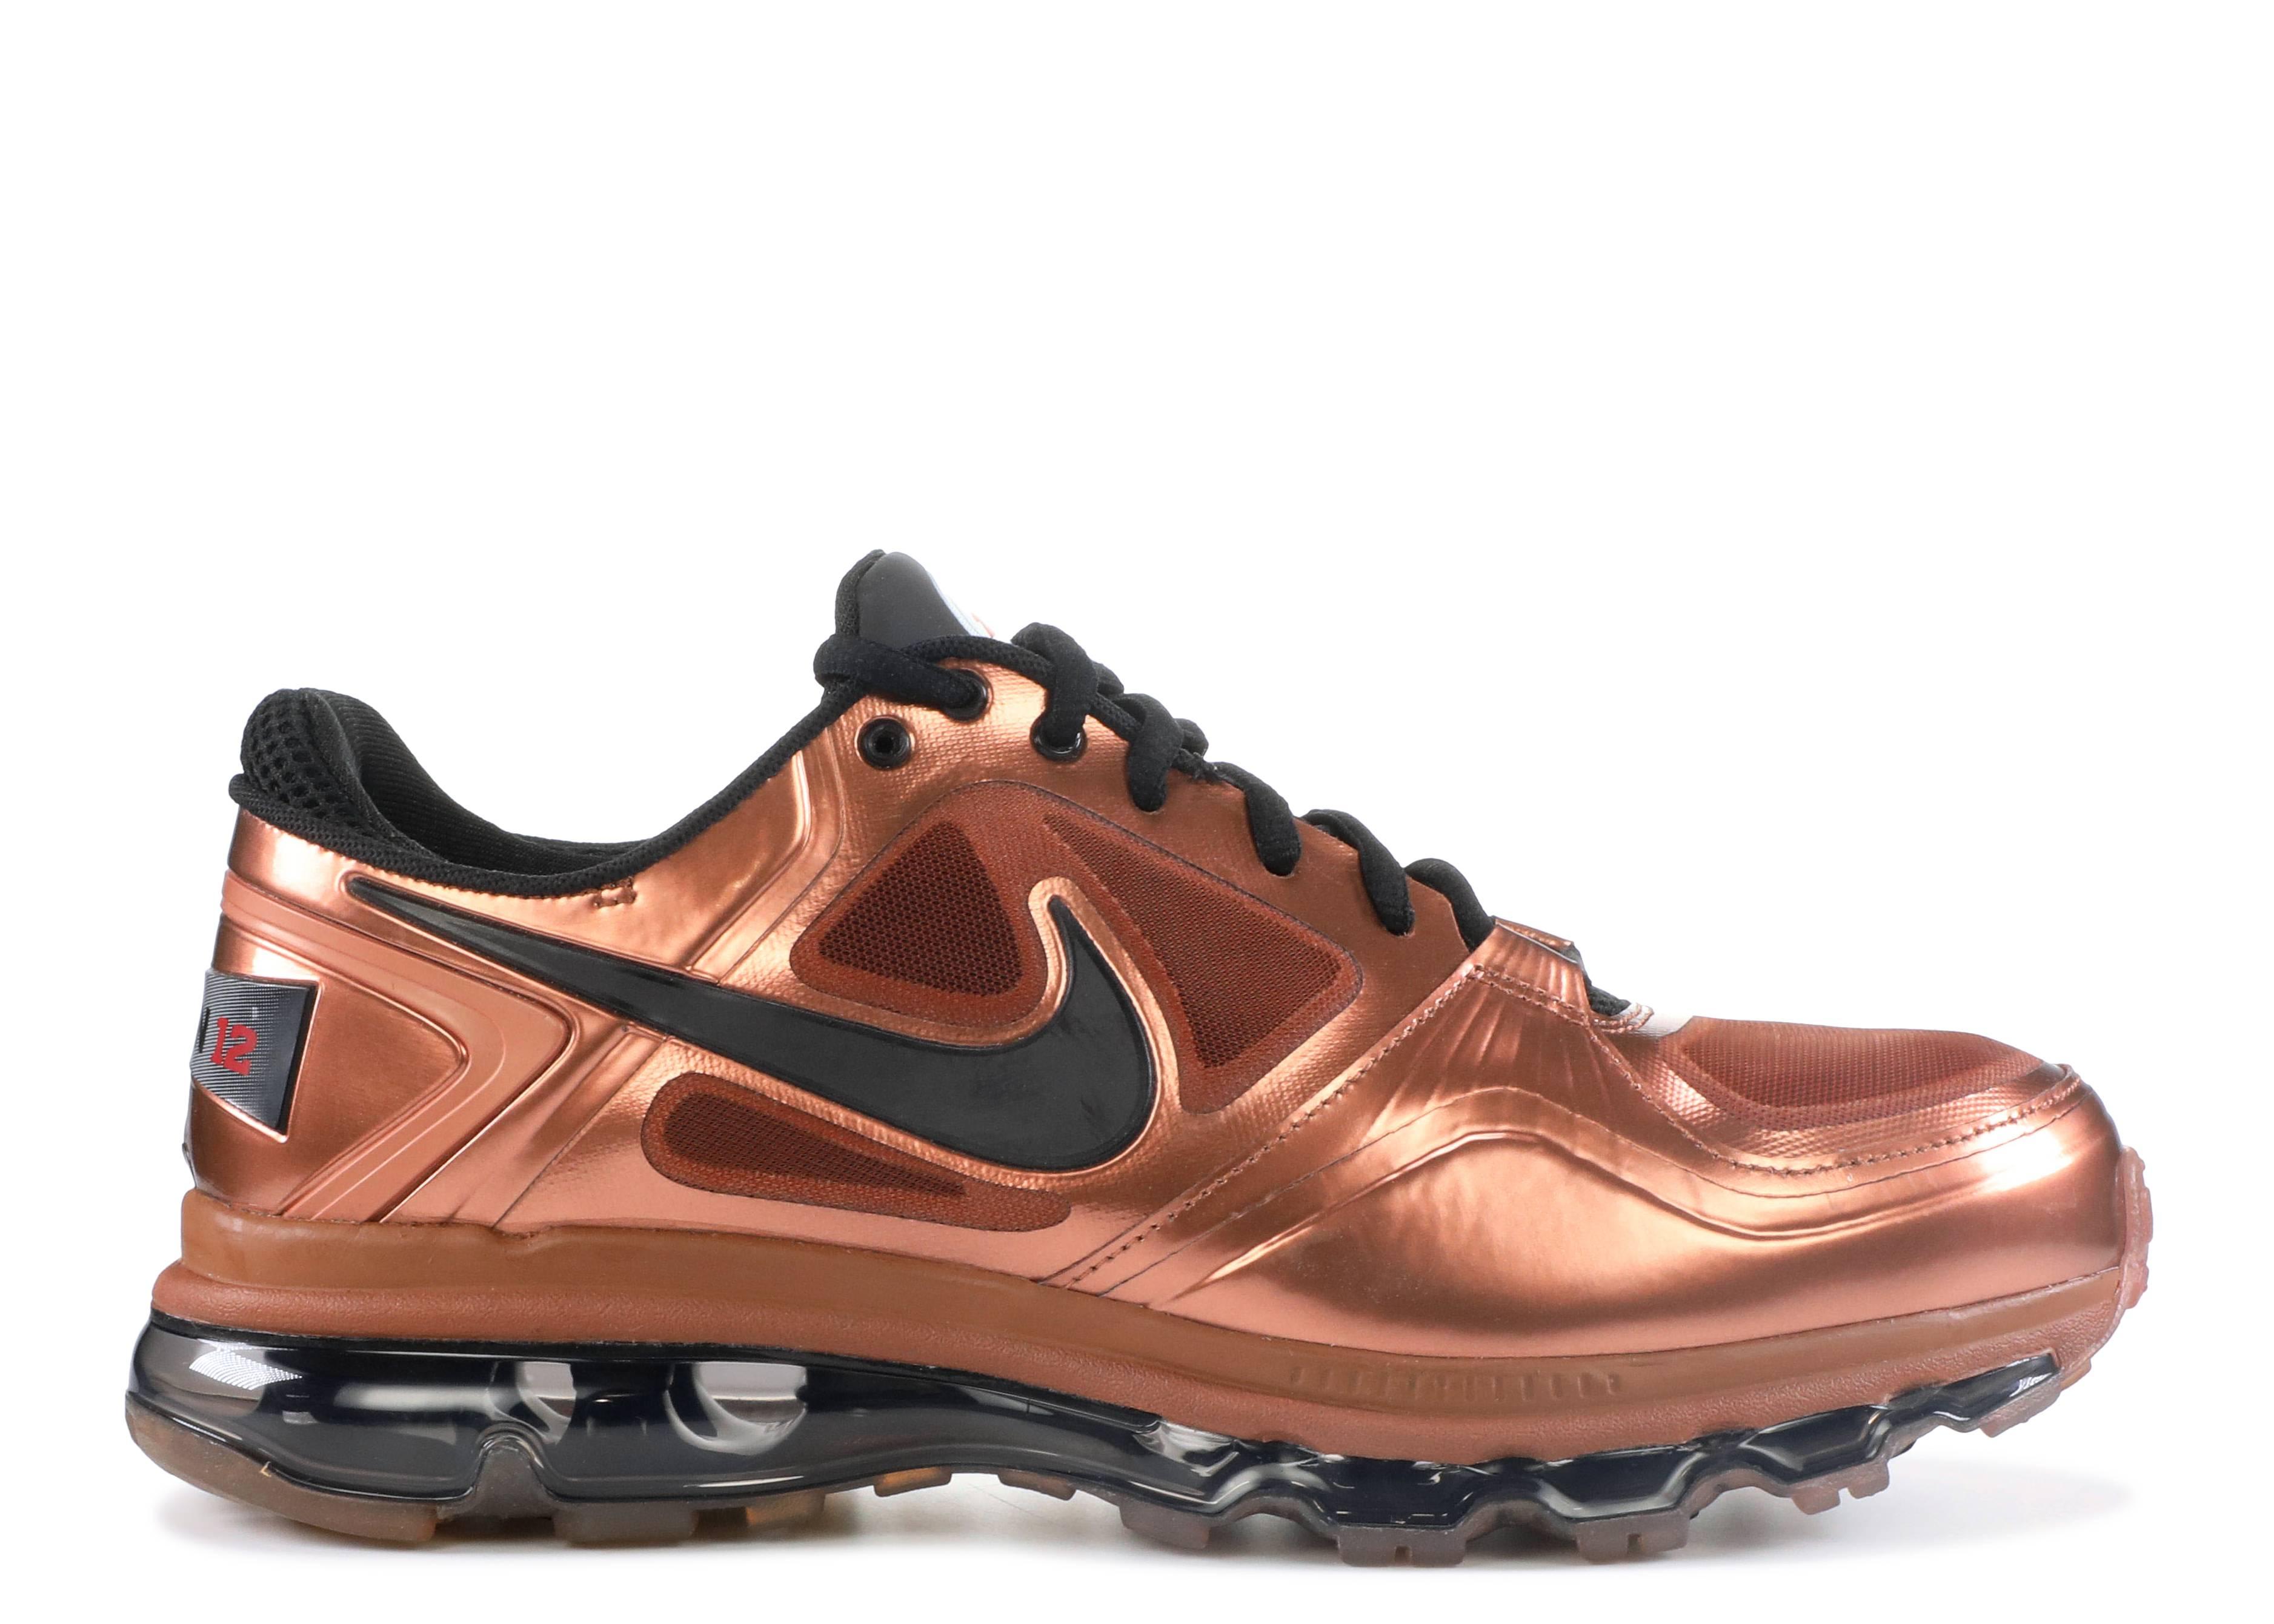 Nike Trainer 1.3 Max+